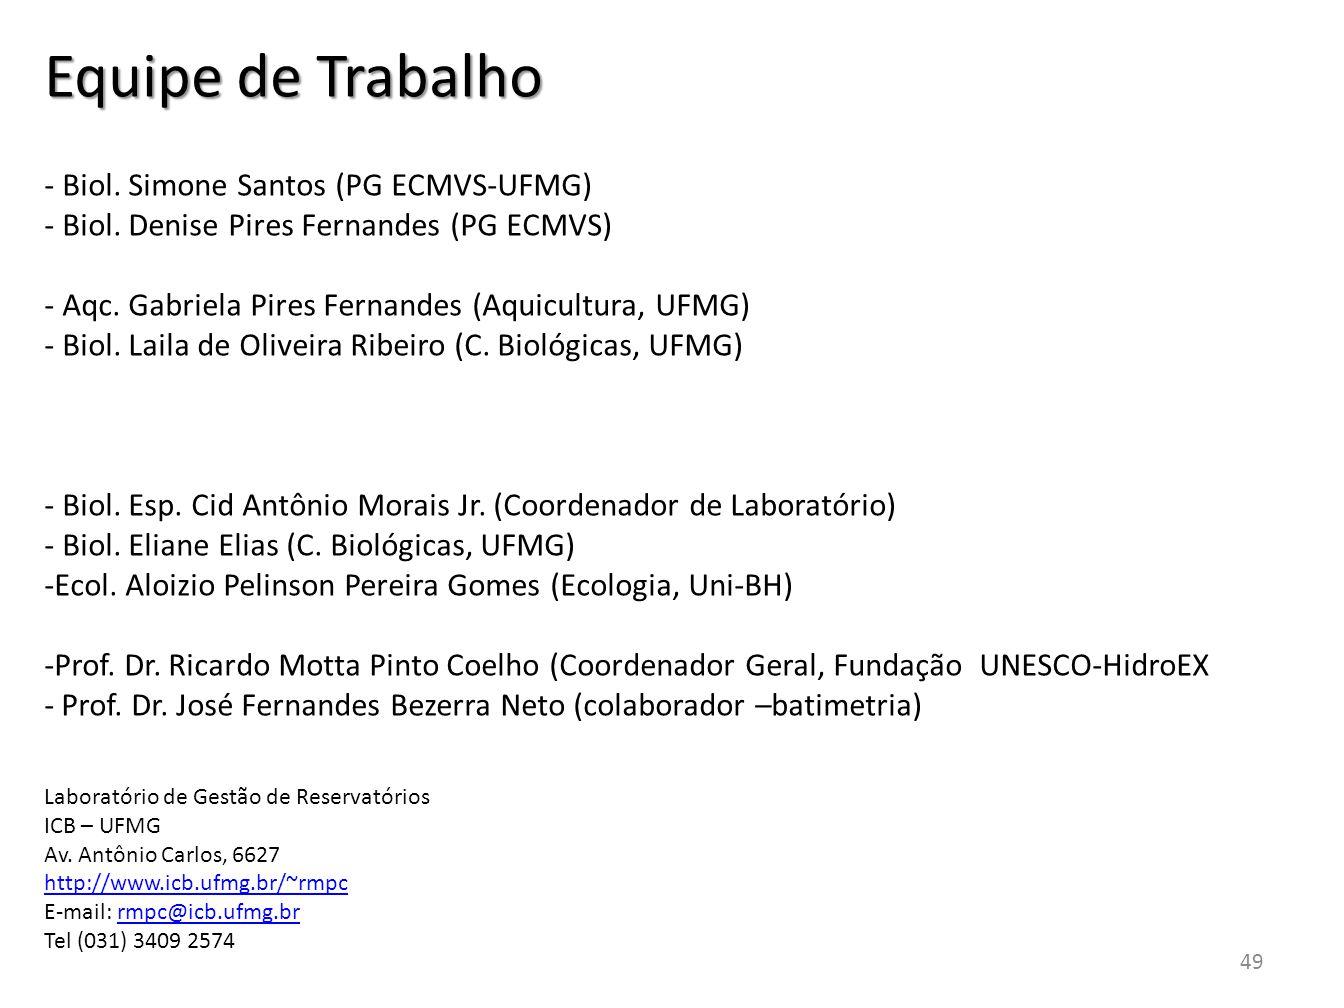 Equipe de Trabalho - Biol. Simone Santos (PG ECMVS-UFMG) - Biol. Denise Pires Fernandes (PG ECMVS) - Aqc. Gabriela Pires Fernandes (Aquicultura, UFMG)